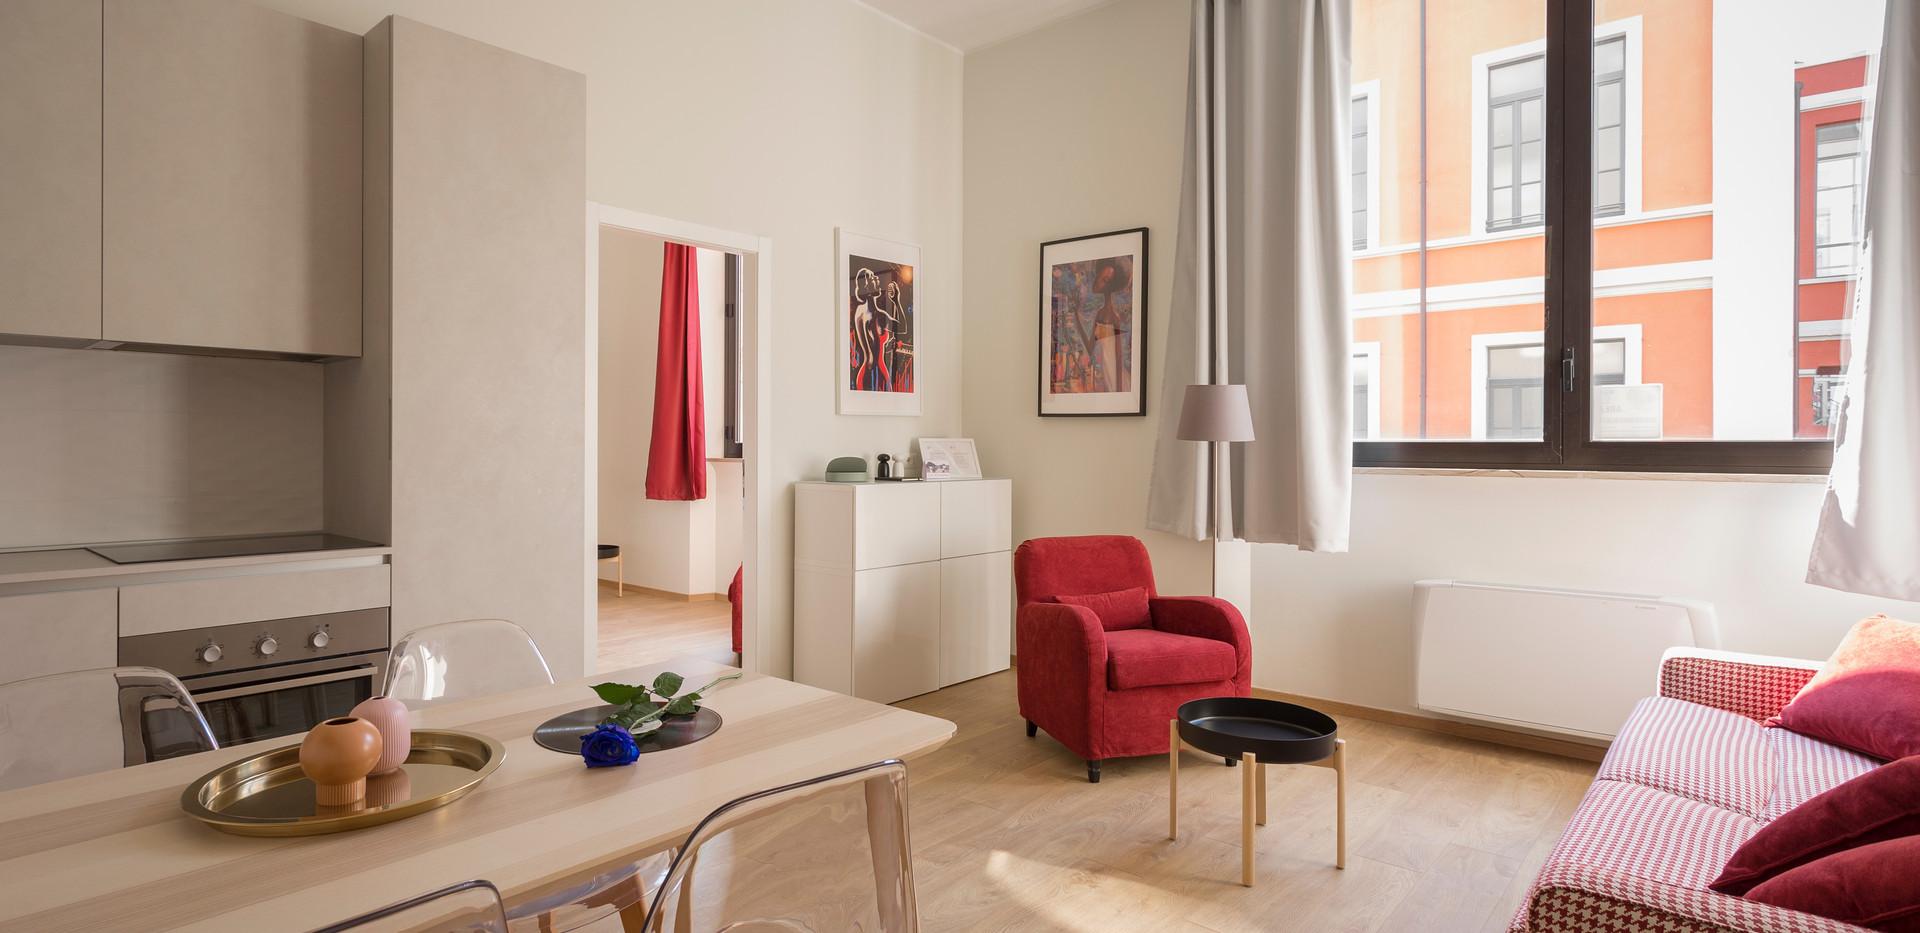 Kensington flat refurbishment